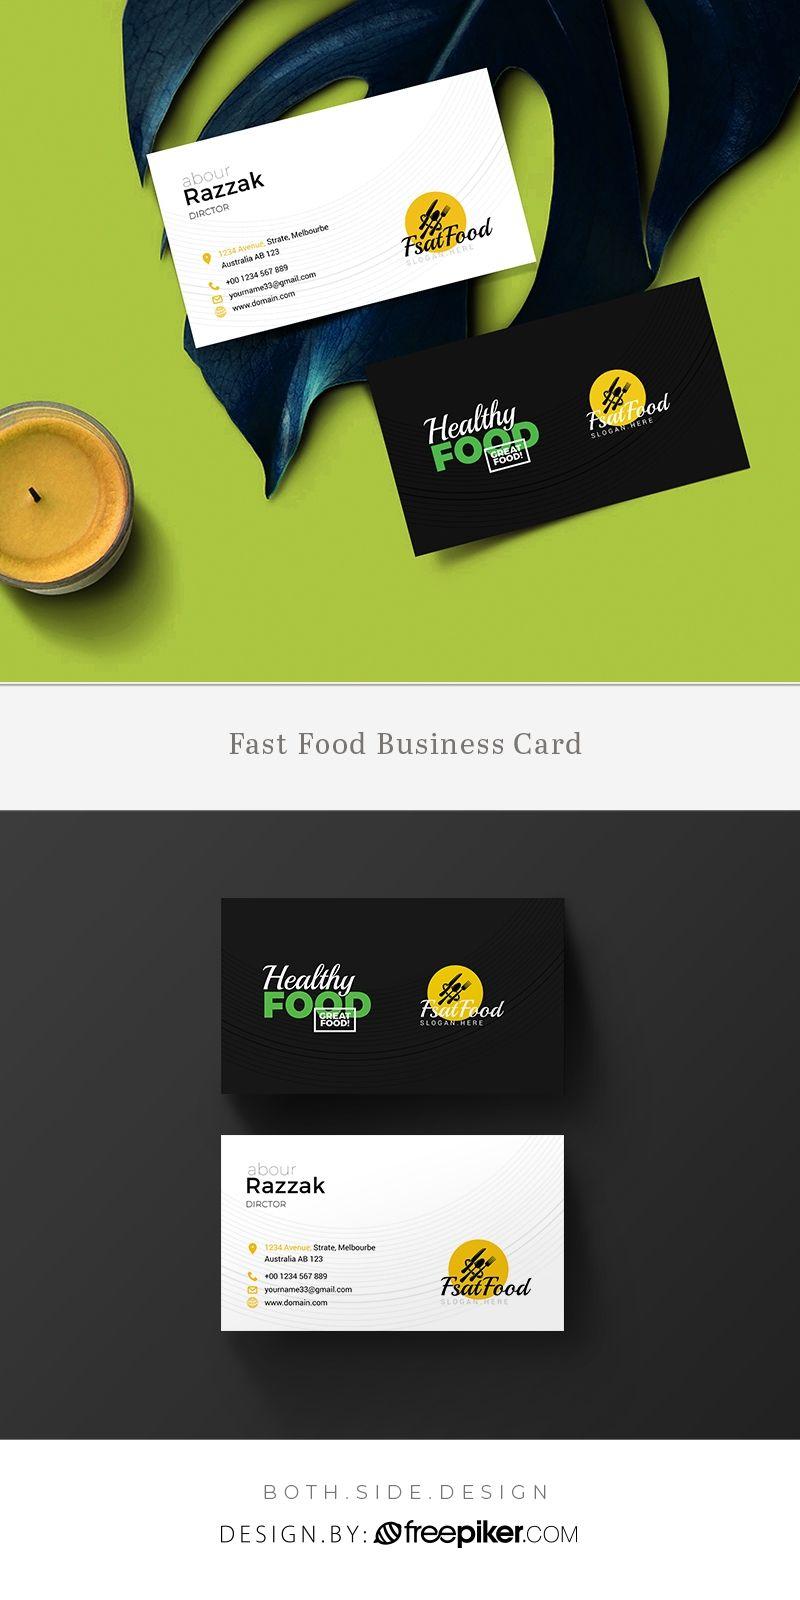 Freepiker Food And Restaurant Business Card Template With Food Business Cards Templ Restaurant Business Cards Food Business Card Food And Restaurant Business